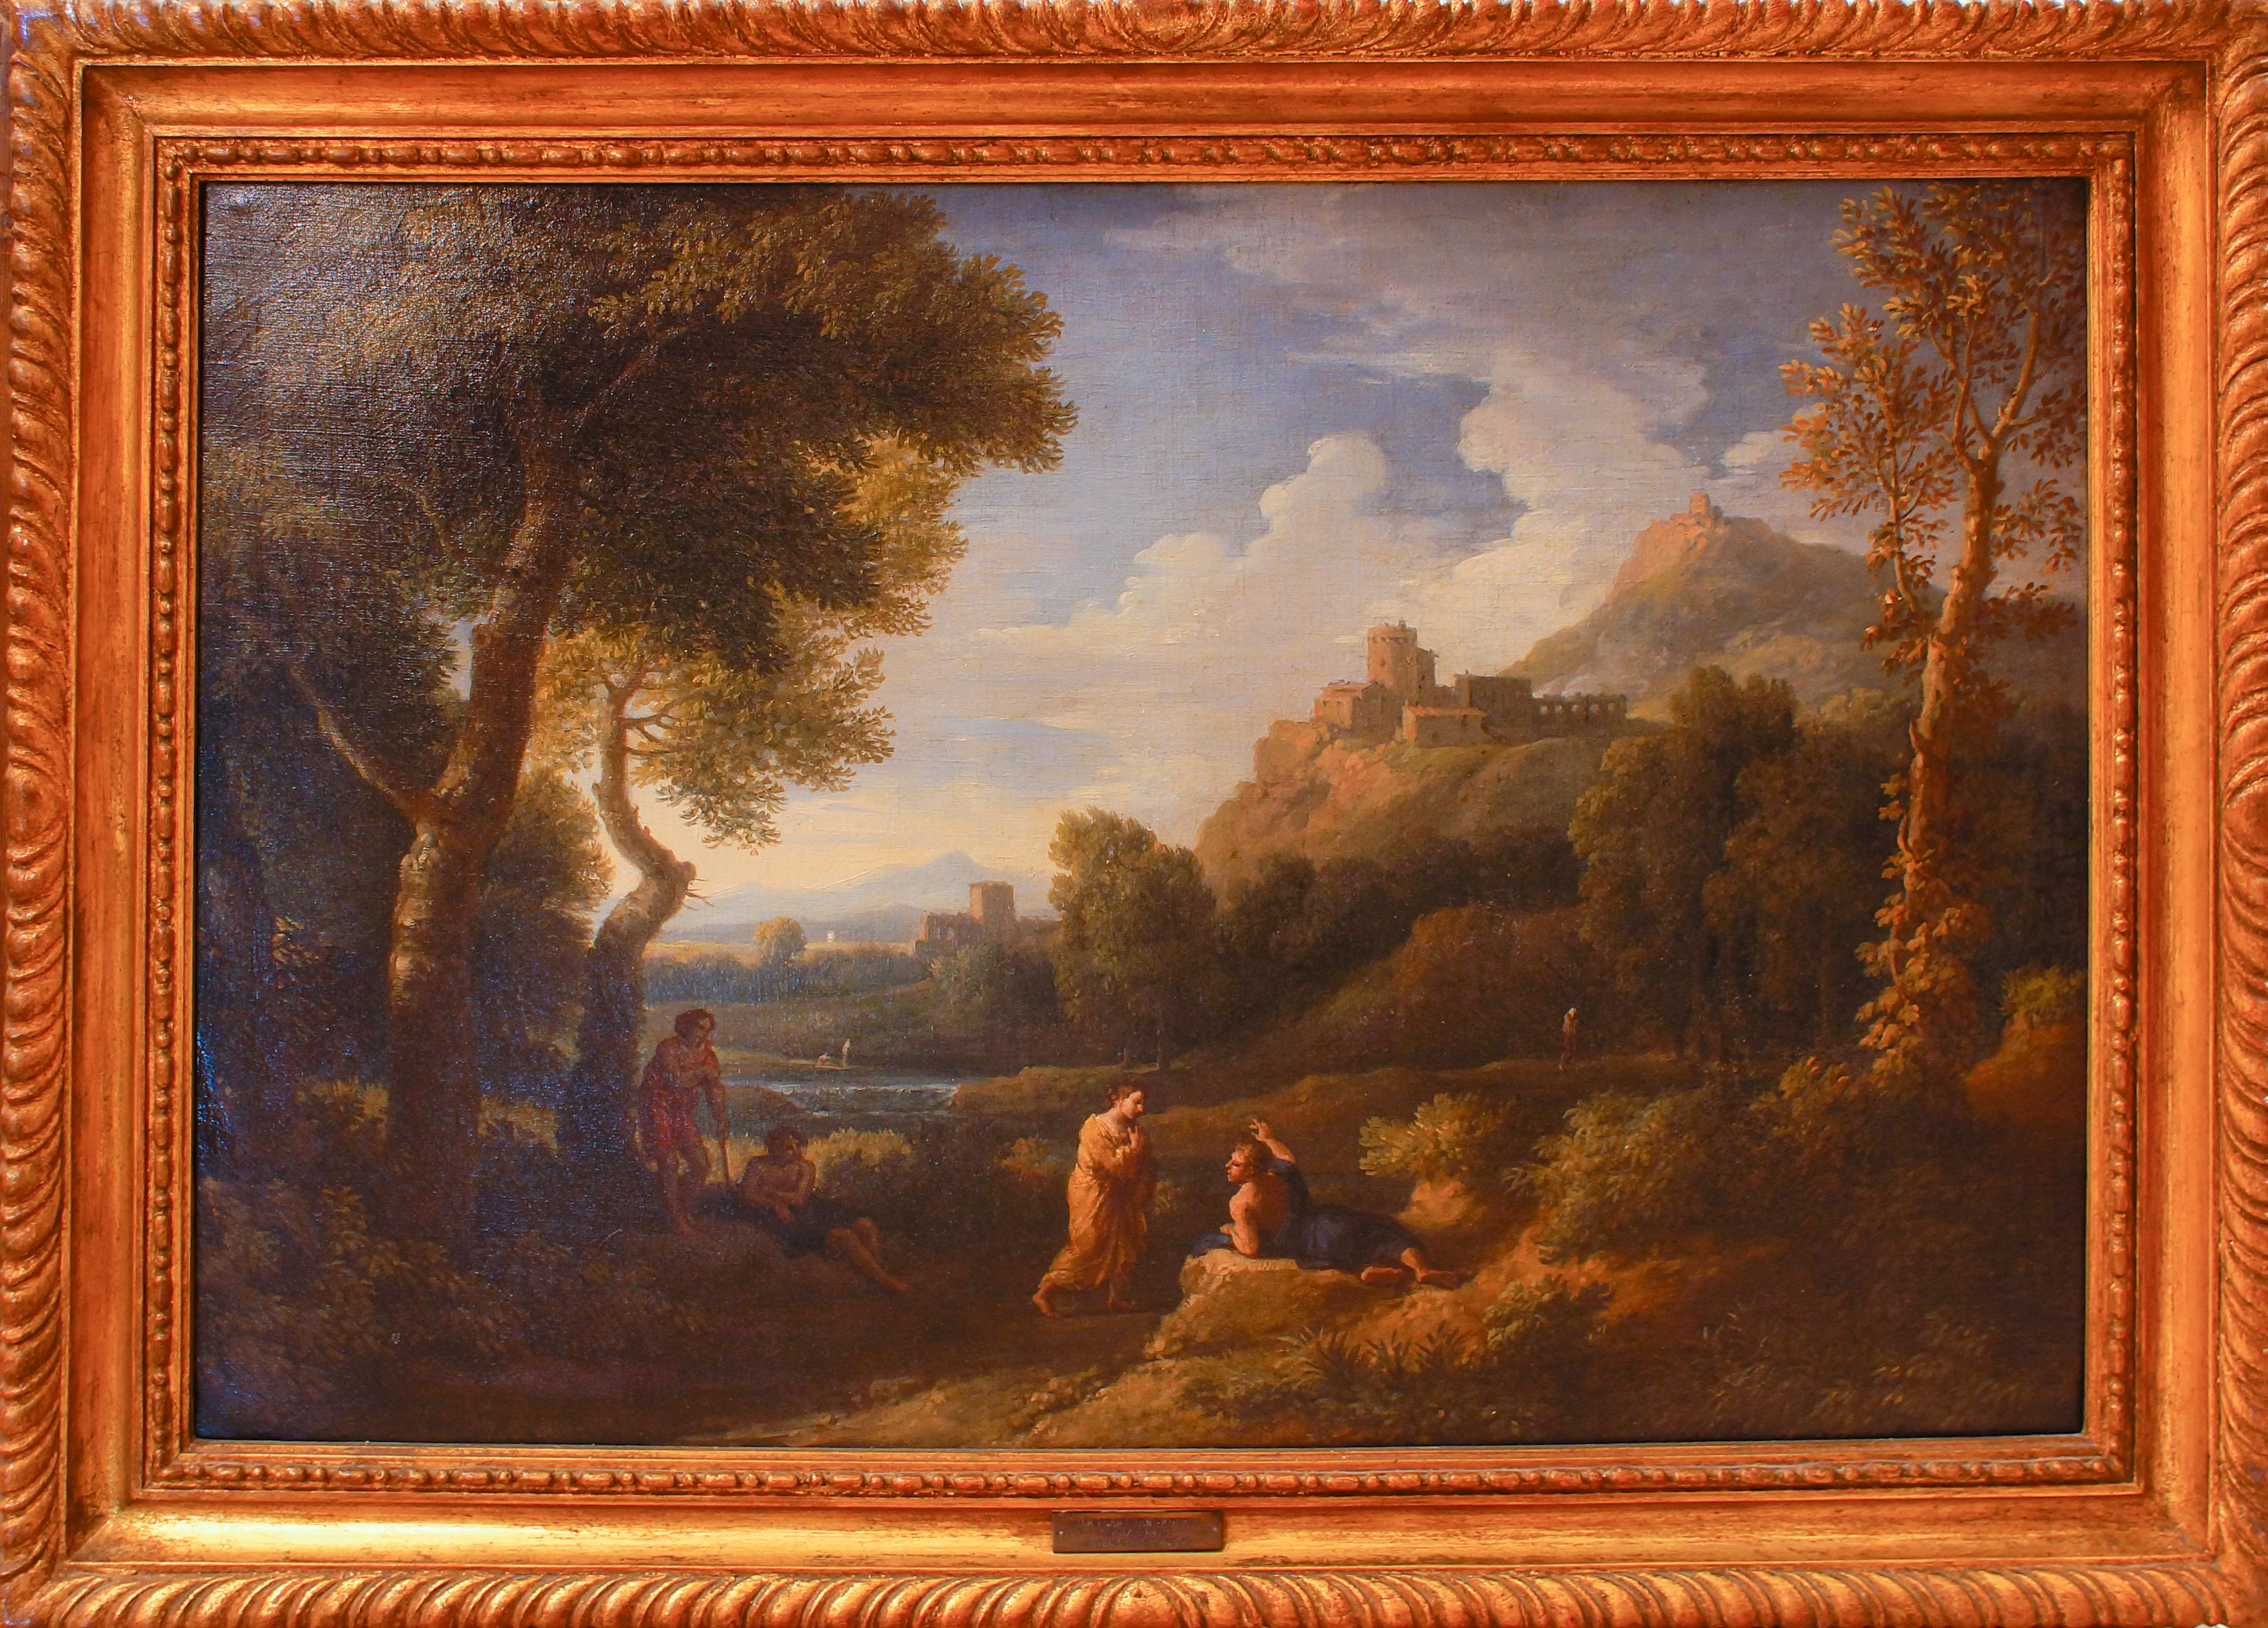 Pair of Roman Landscapes - by J.F. Van Bloemen - 18th Century